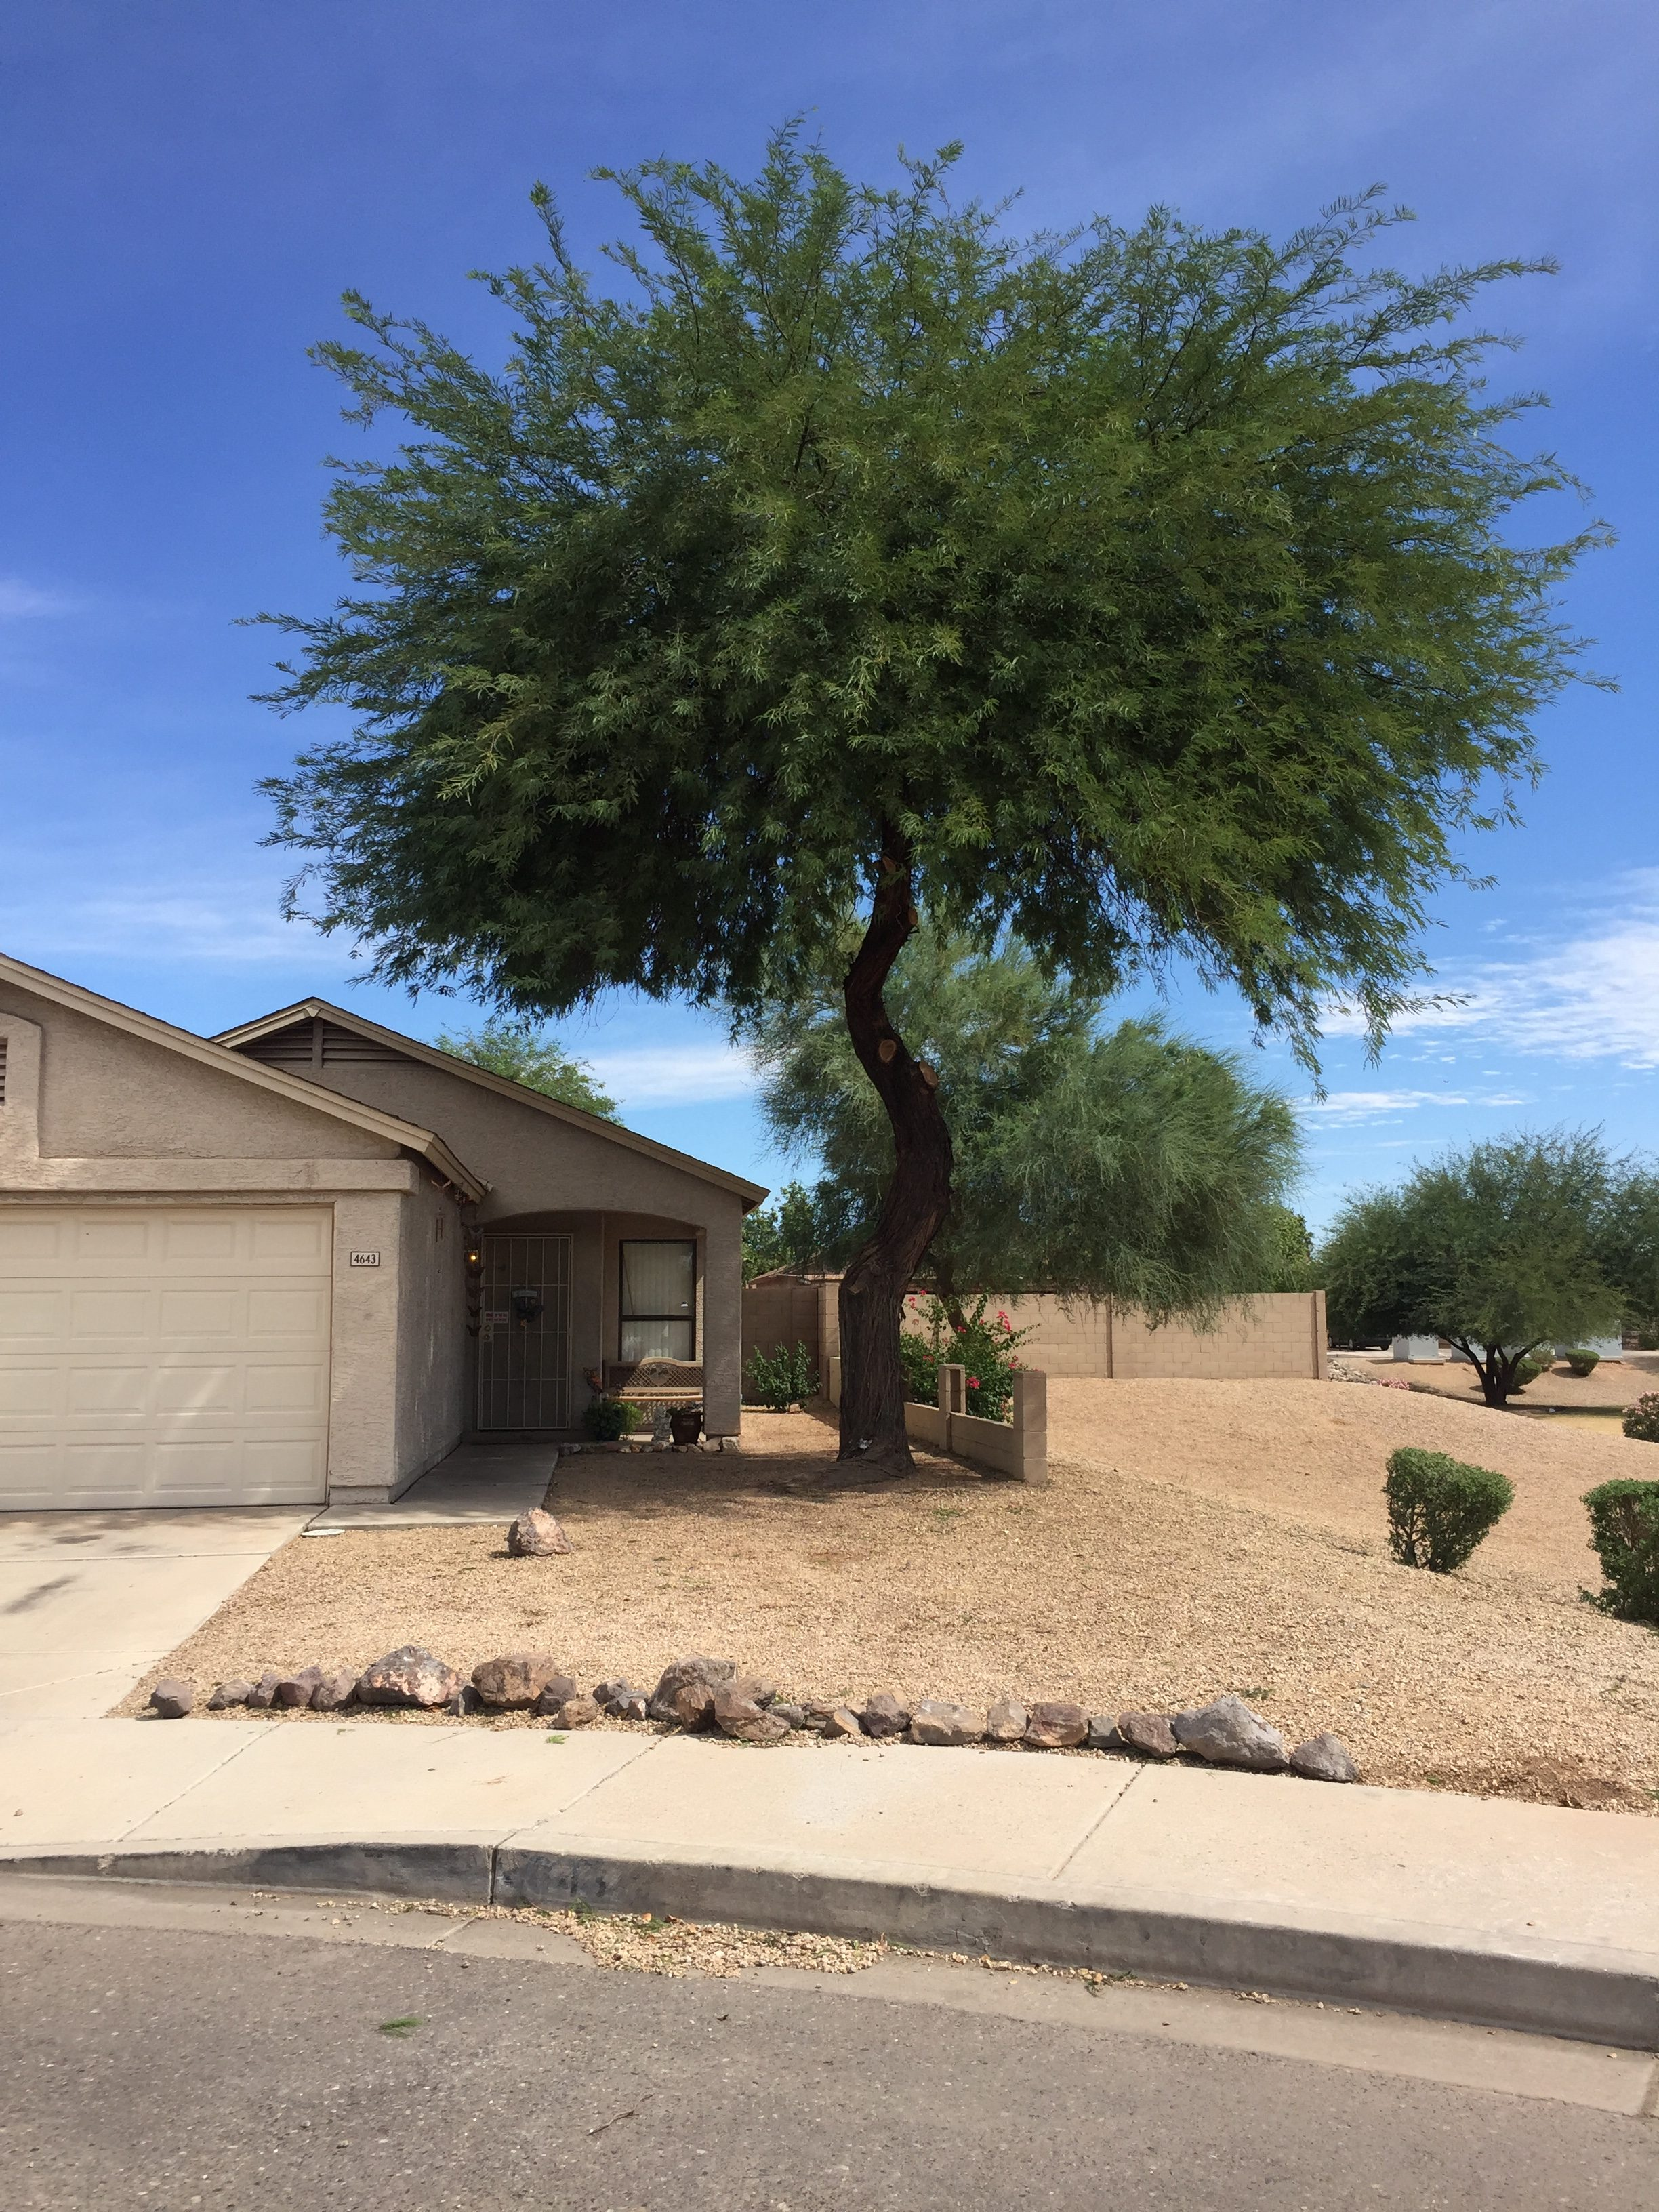 Tree Trimming in Phoenix Arizona - After